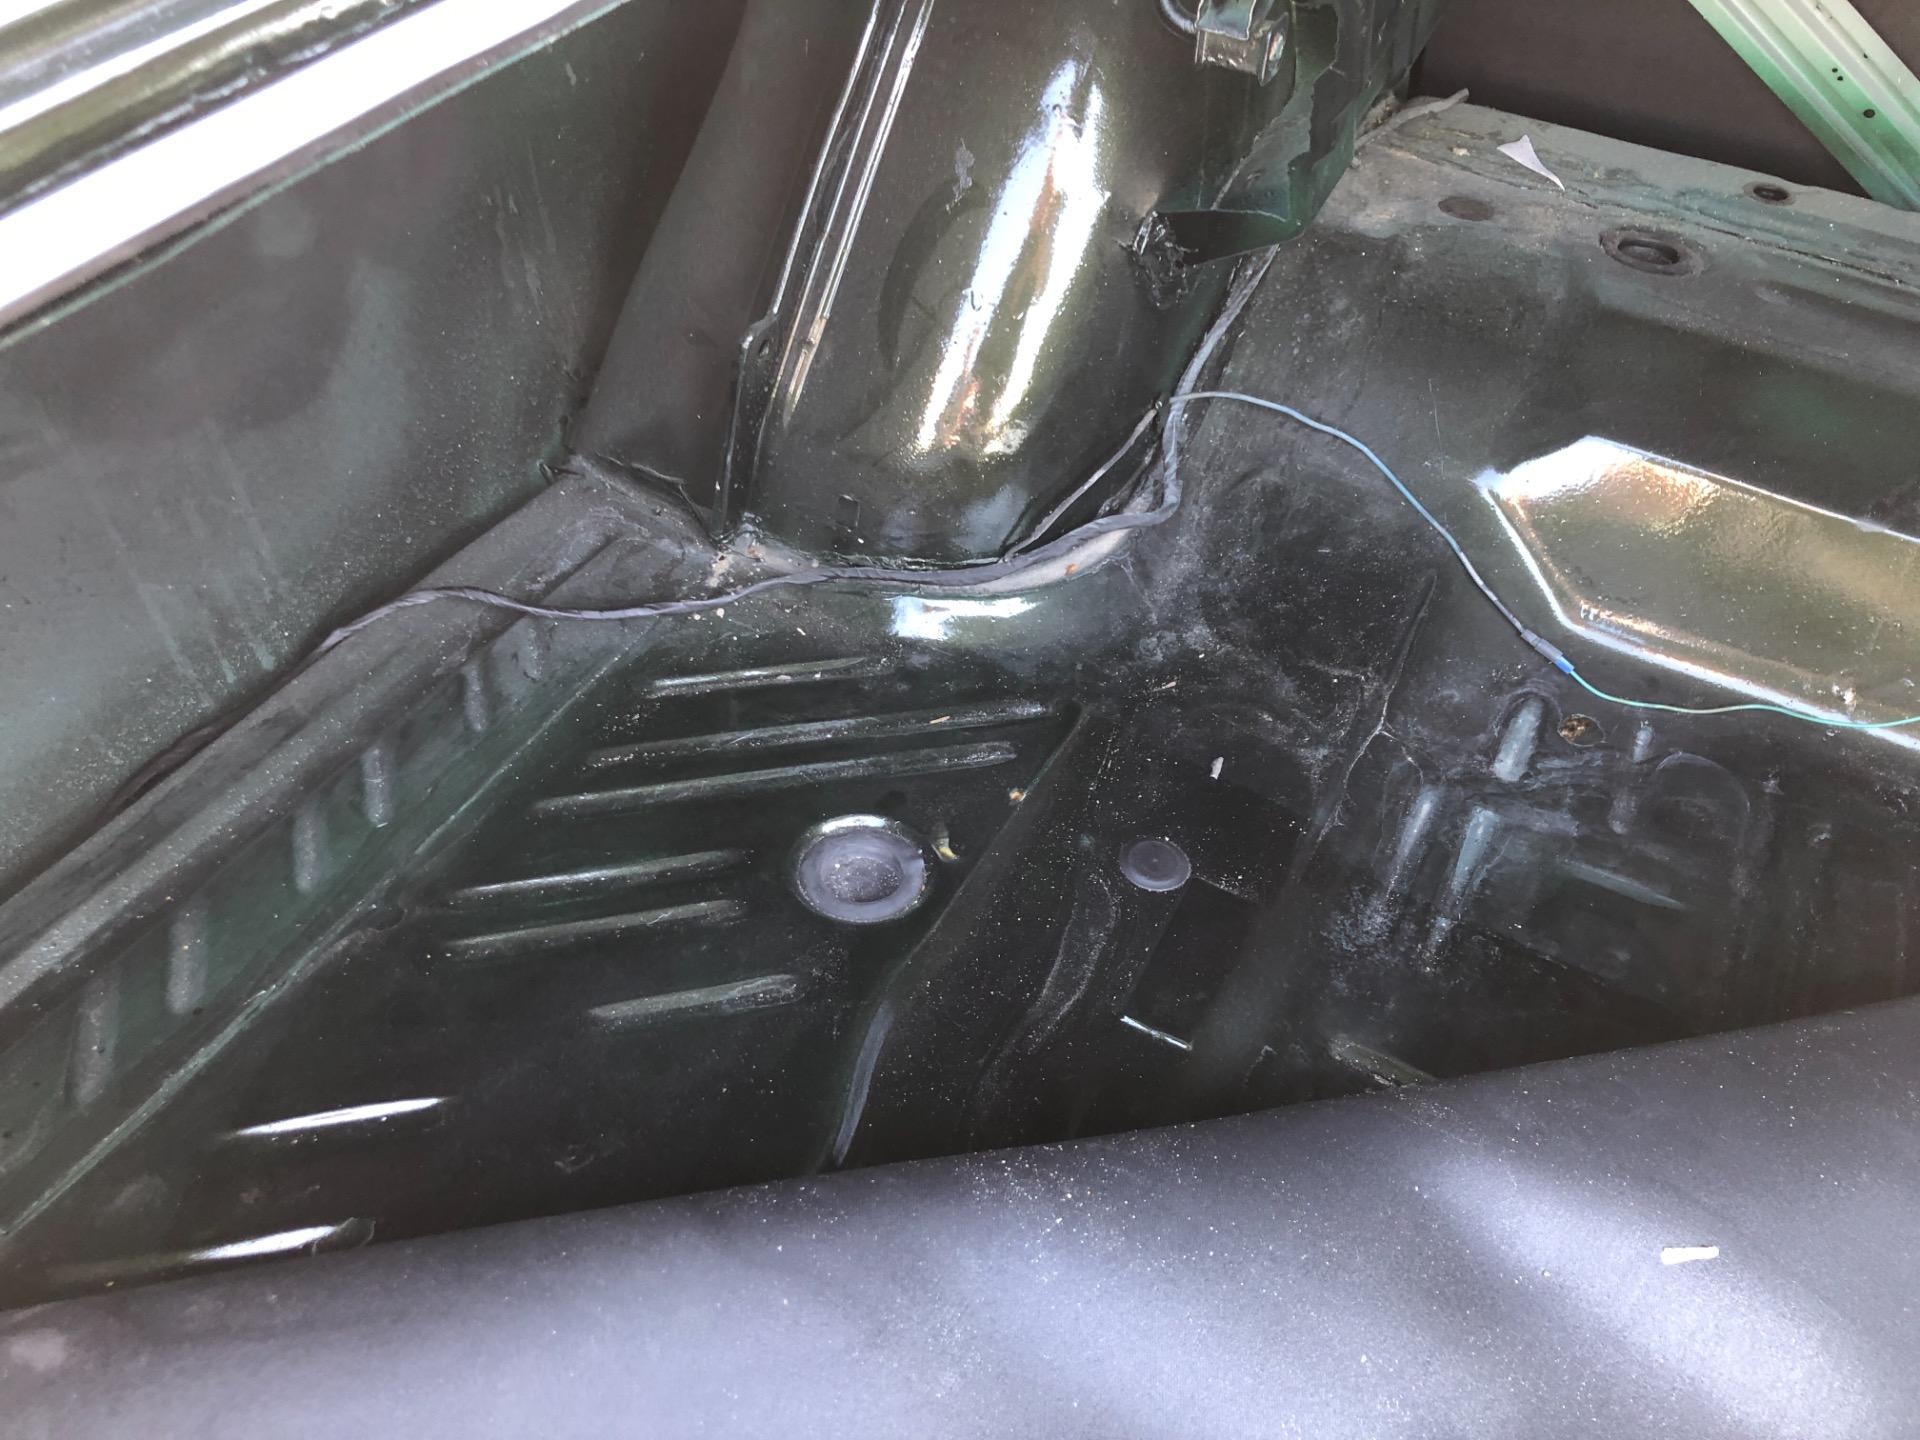 Used 1968 Plymouth GTX - REAL HEMI CAR - 528 C.I. CRATE HEMI ENGINE - | Mundelein, IL